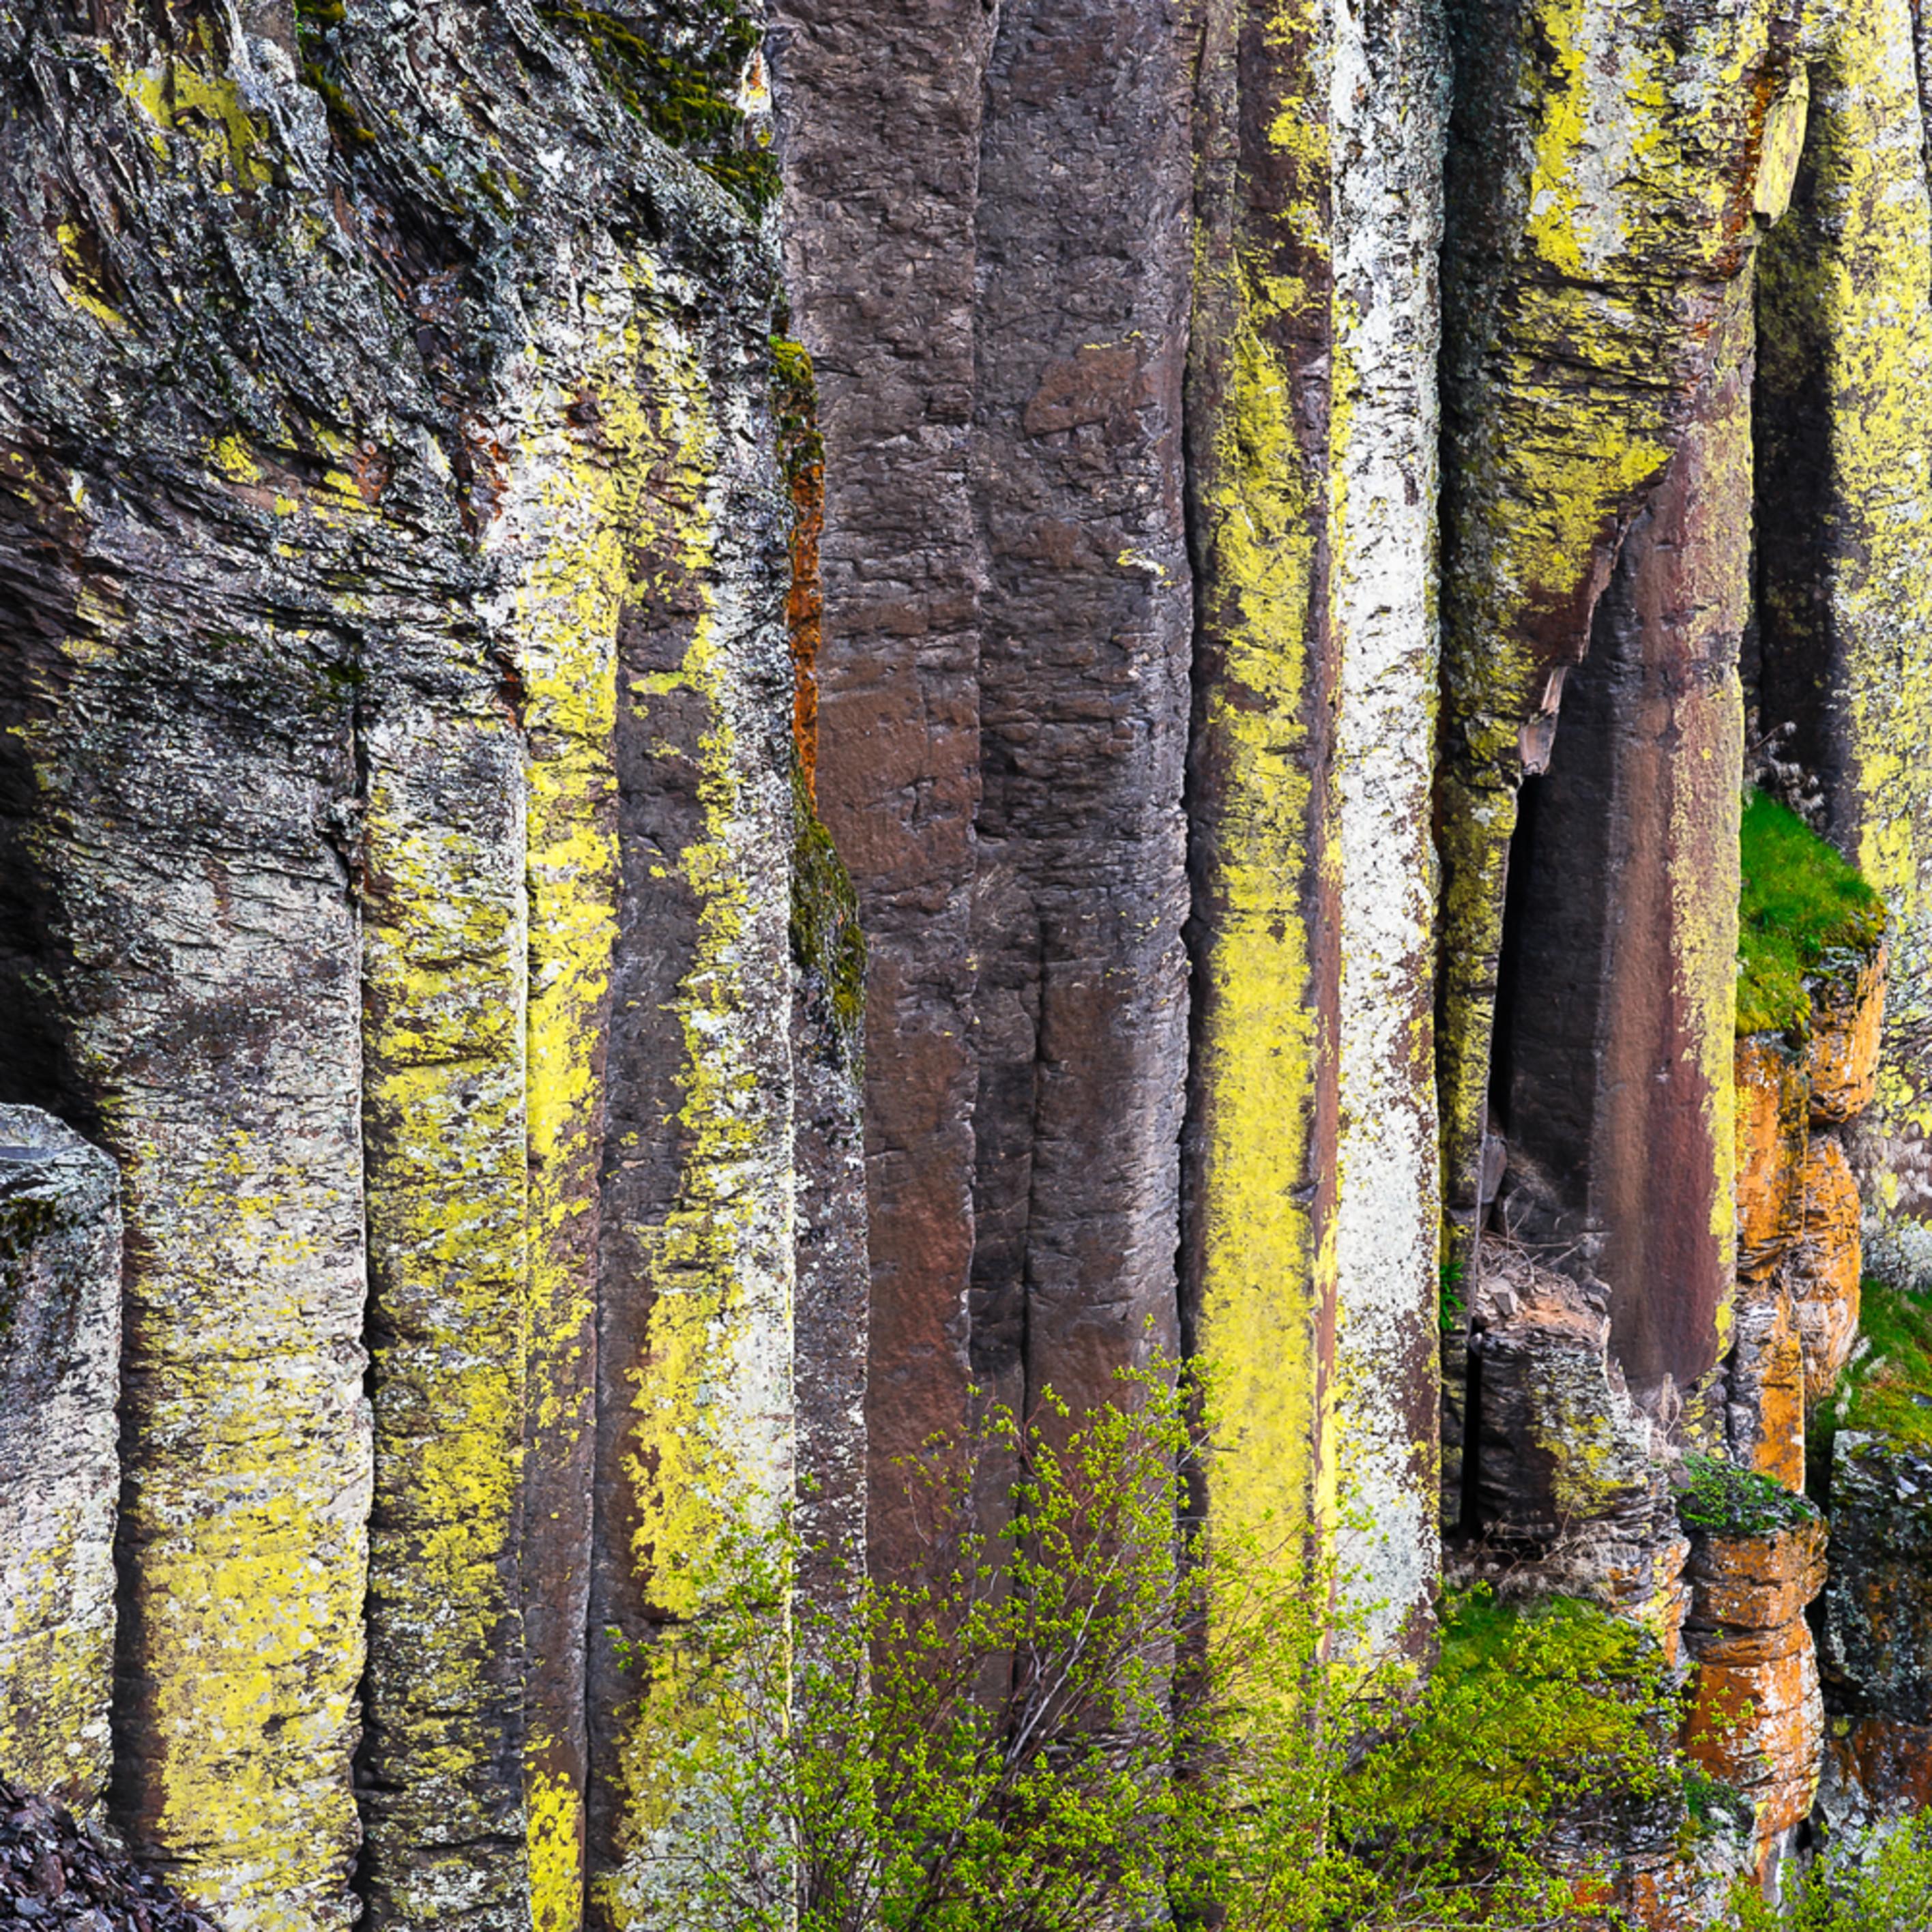 Columnar basalt pothole coulee washington spring 2017 mhdqaz